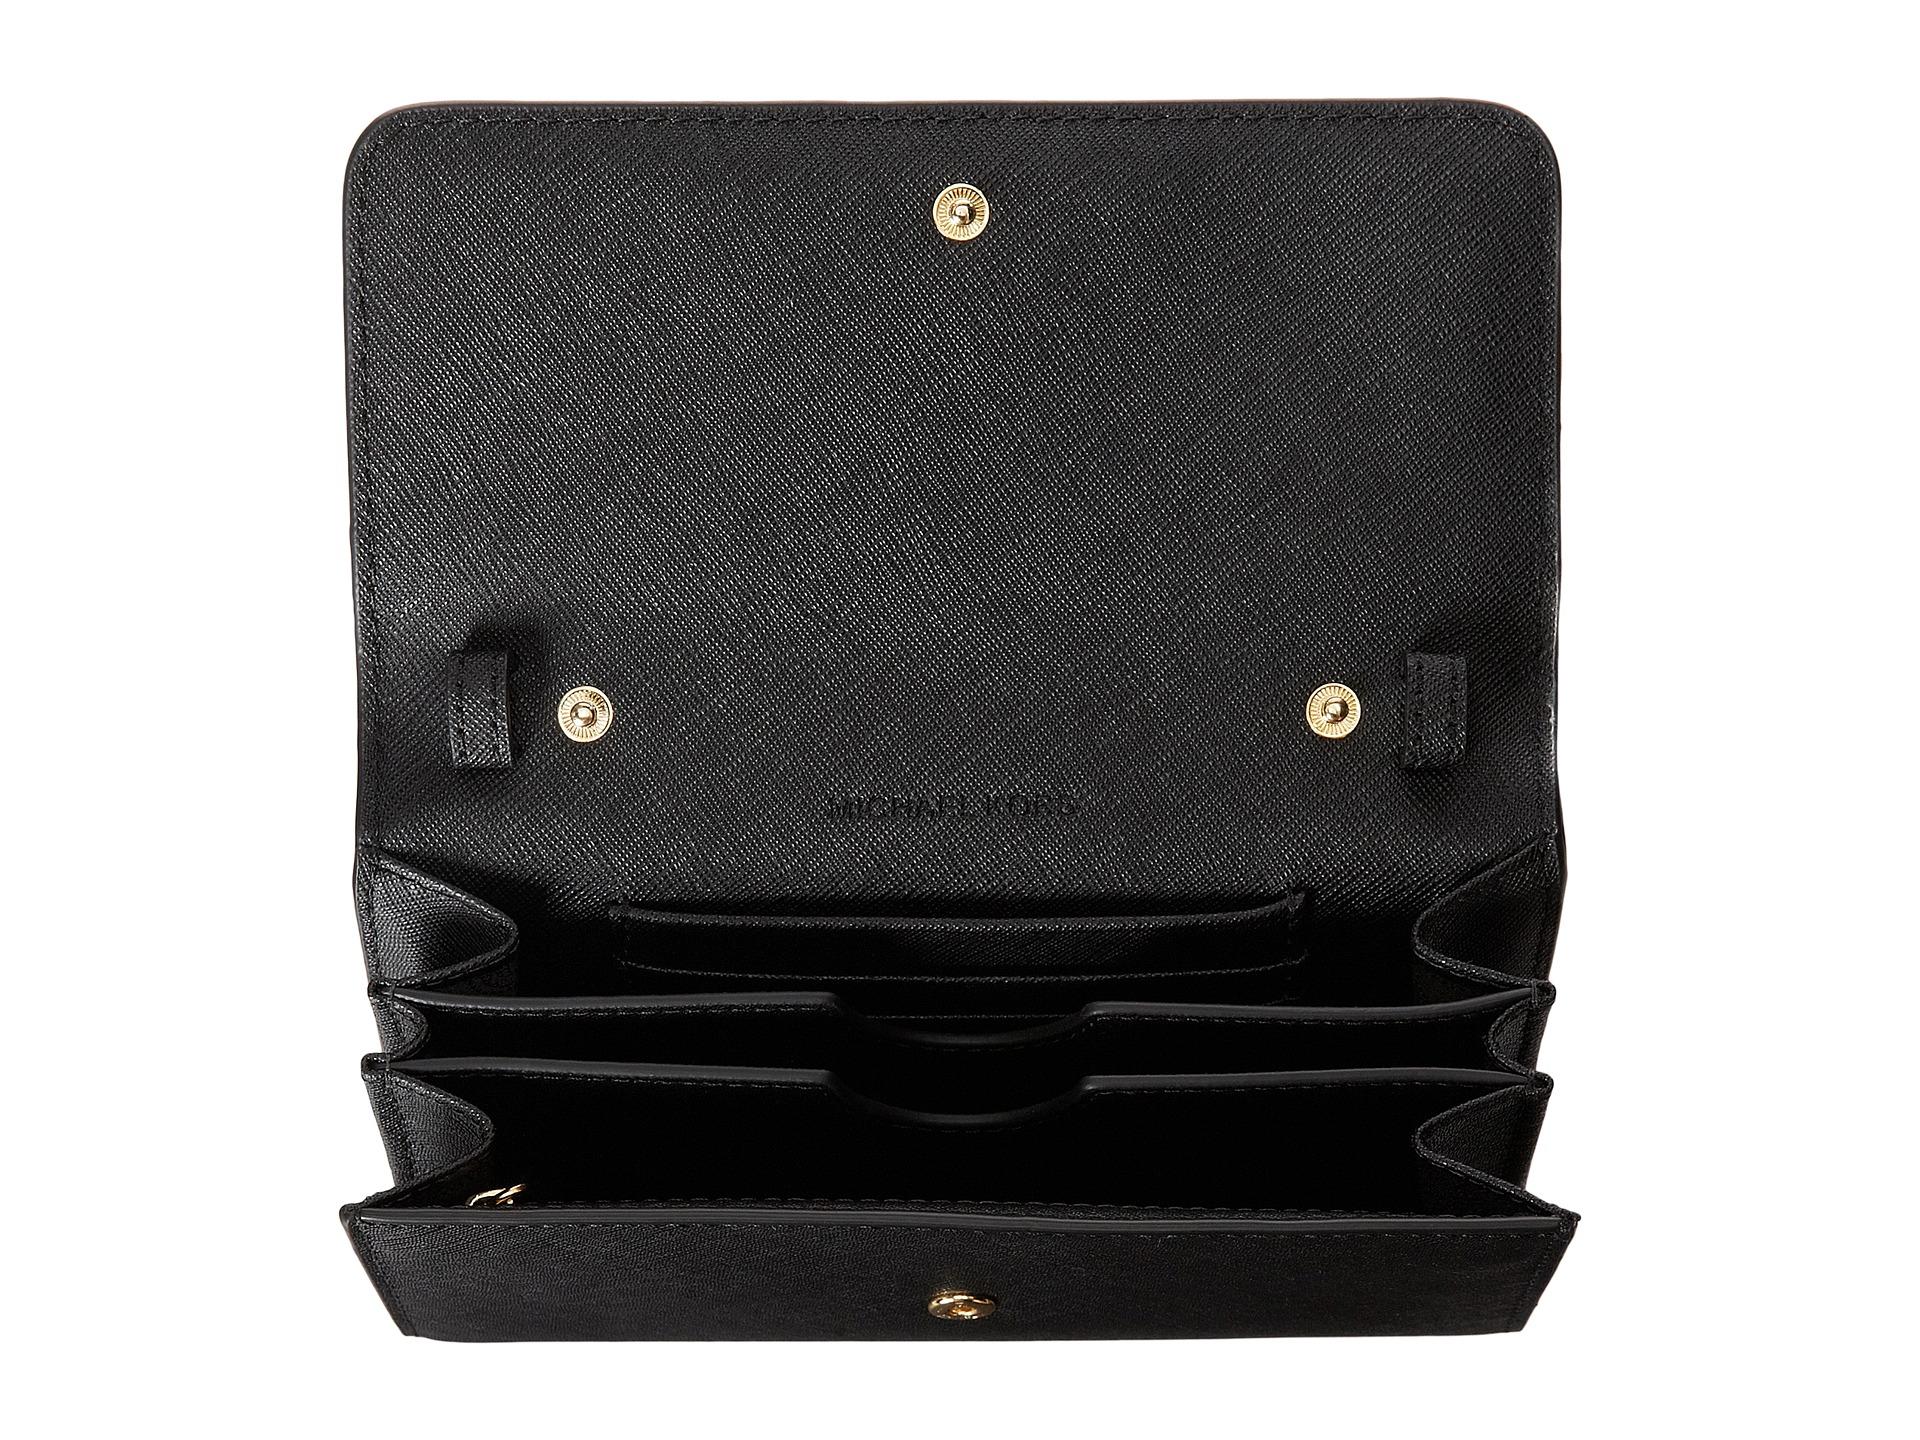 4d9e8753fdd8 michael kors jet set travel wallet on a chain black bedford clutch pink